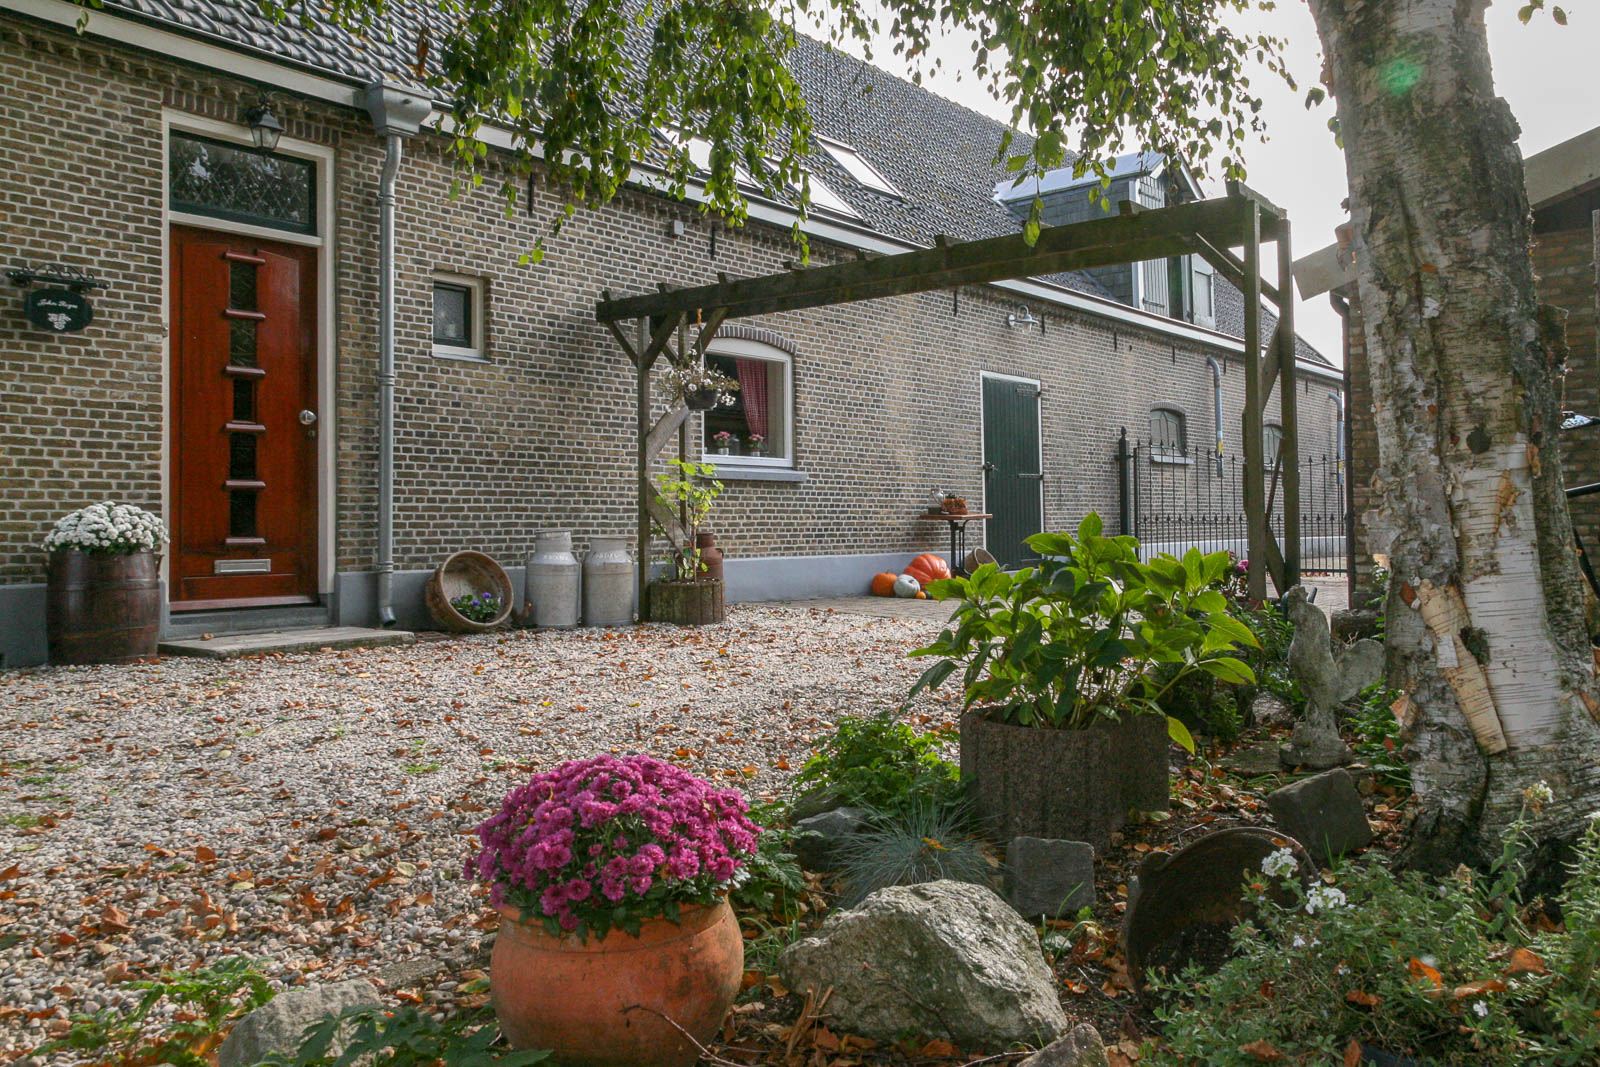 Hillegondahoeve-De Oude Stal-1482